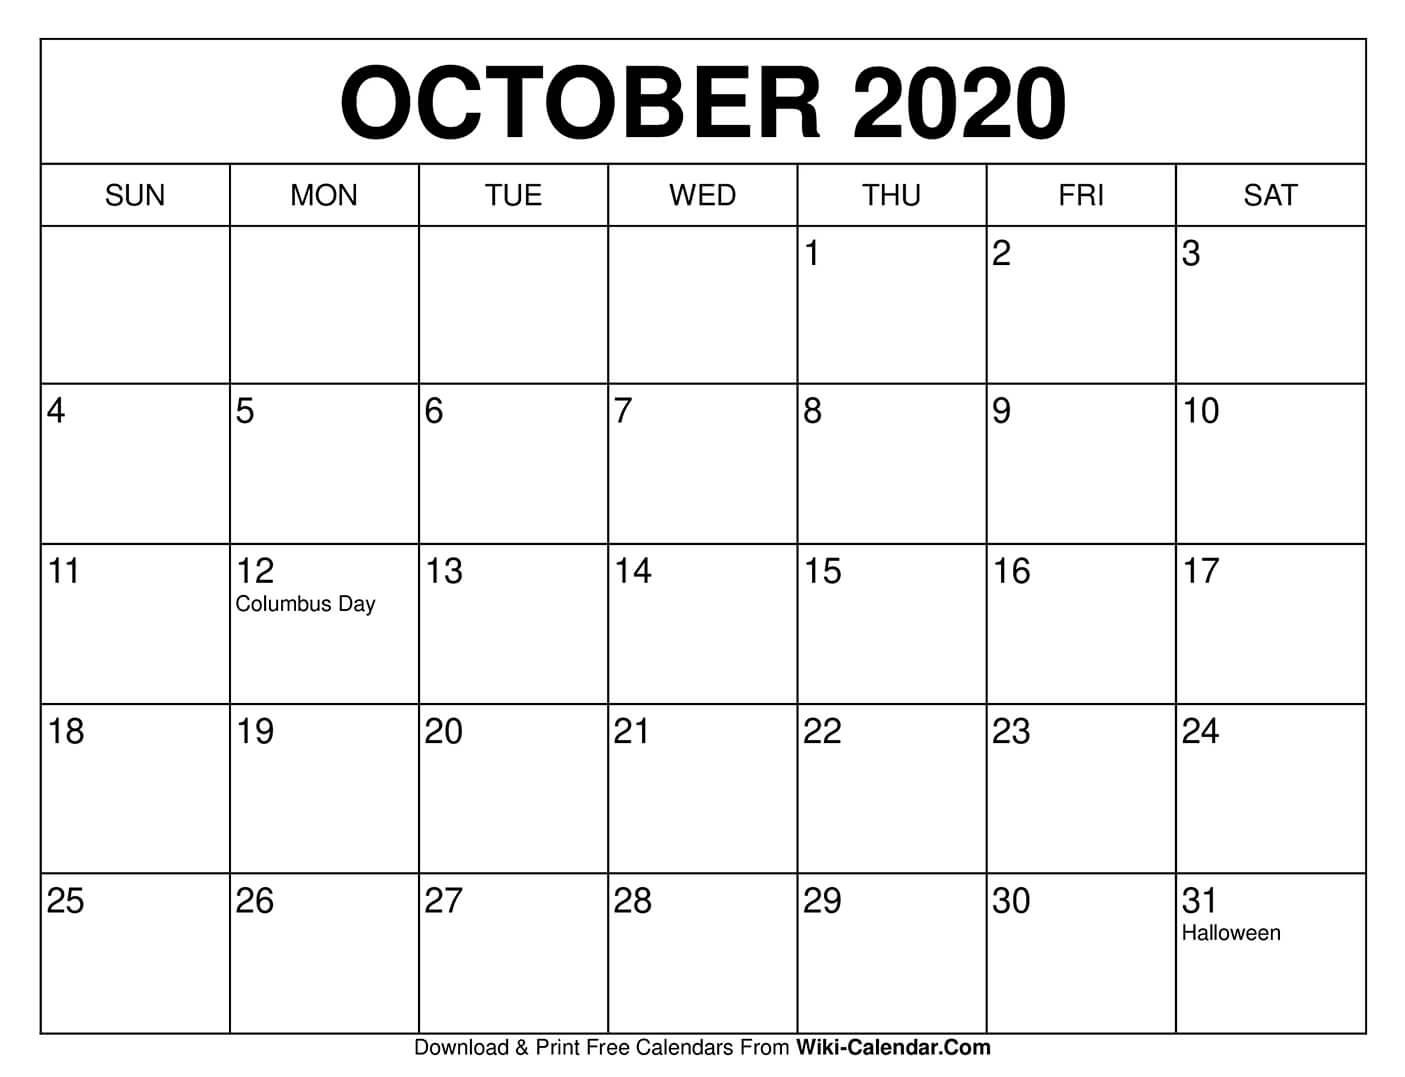 Free Printable October 2021 Calendars National Calendar October 2021